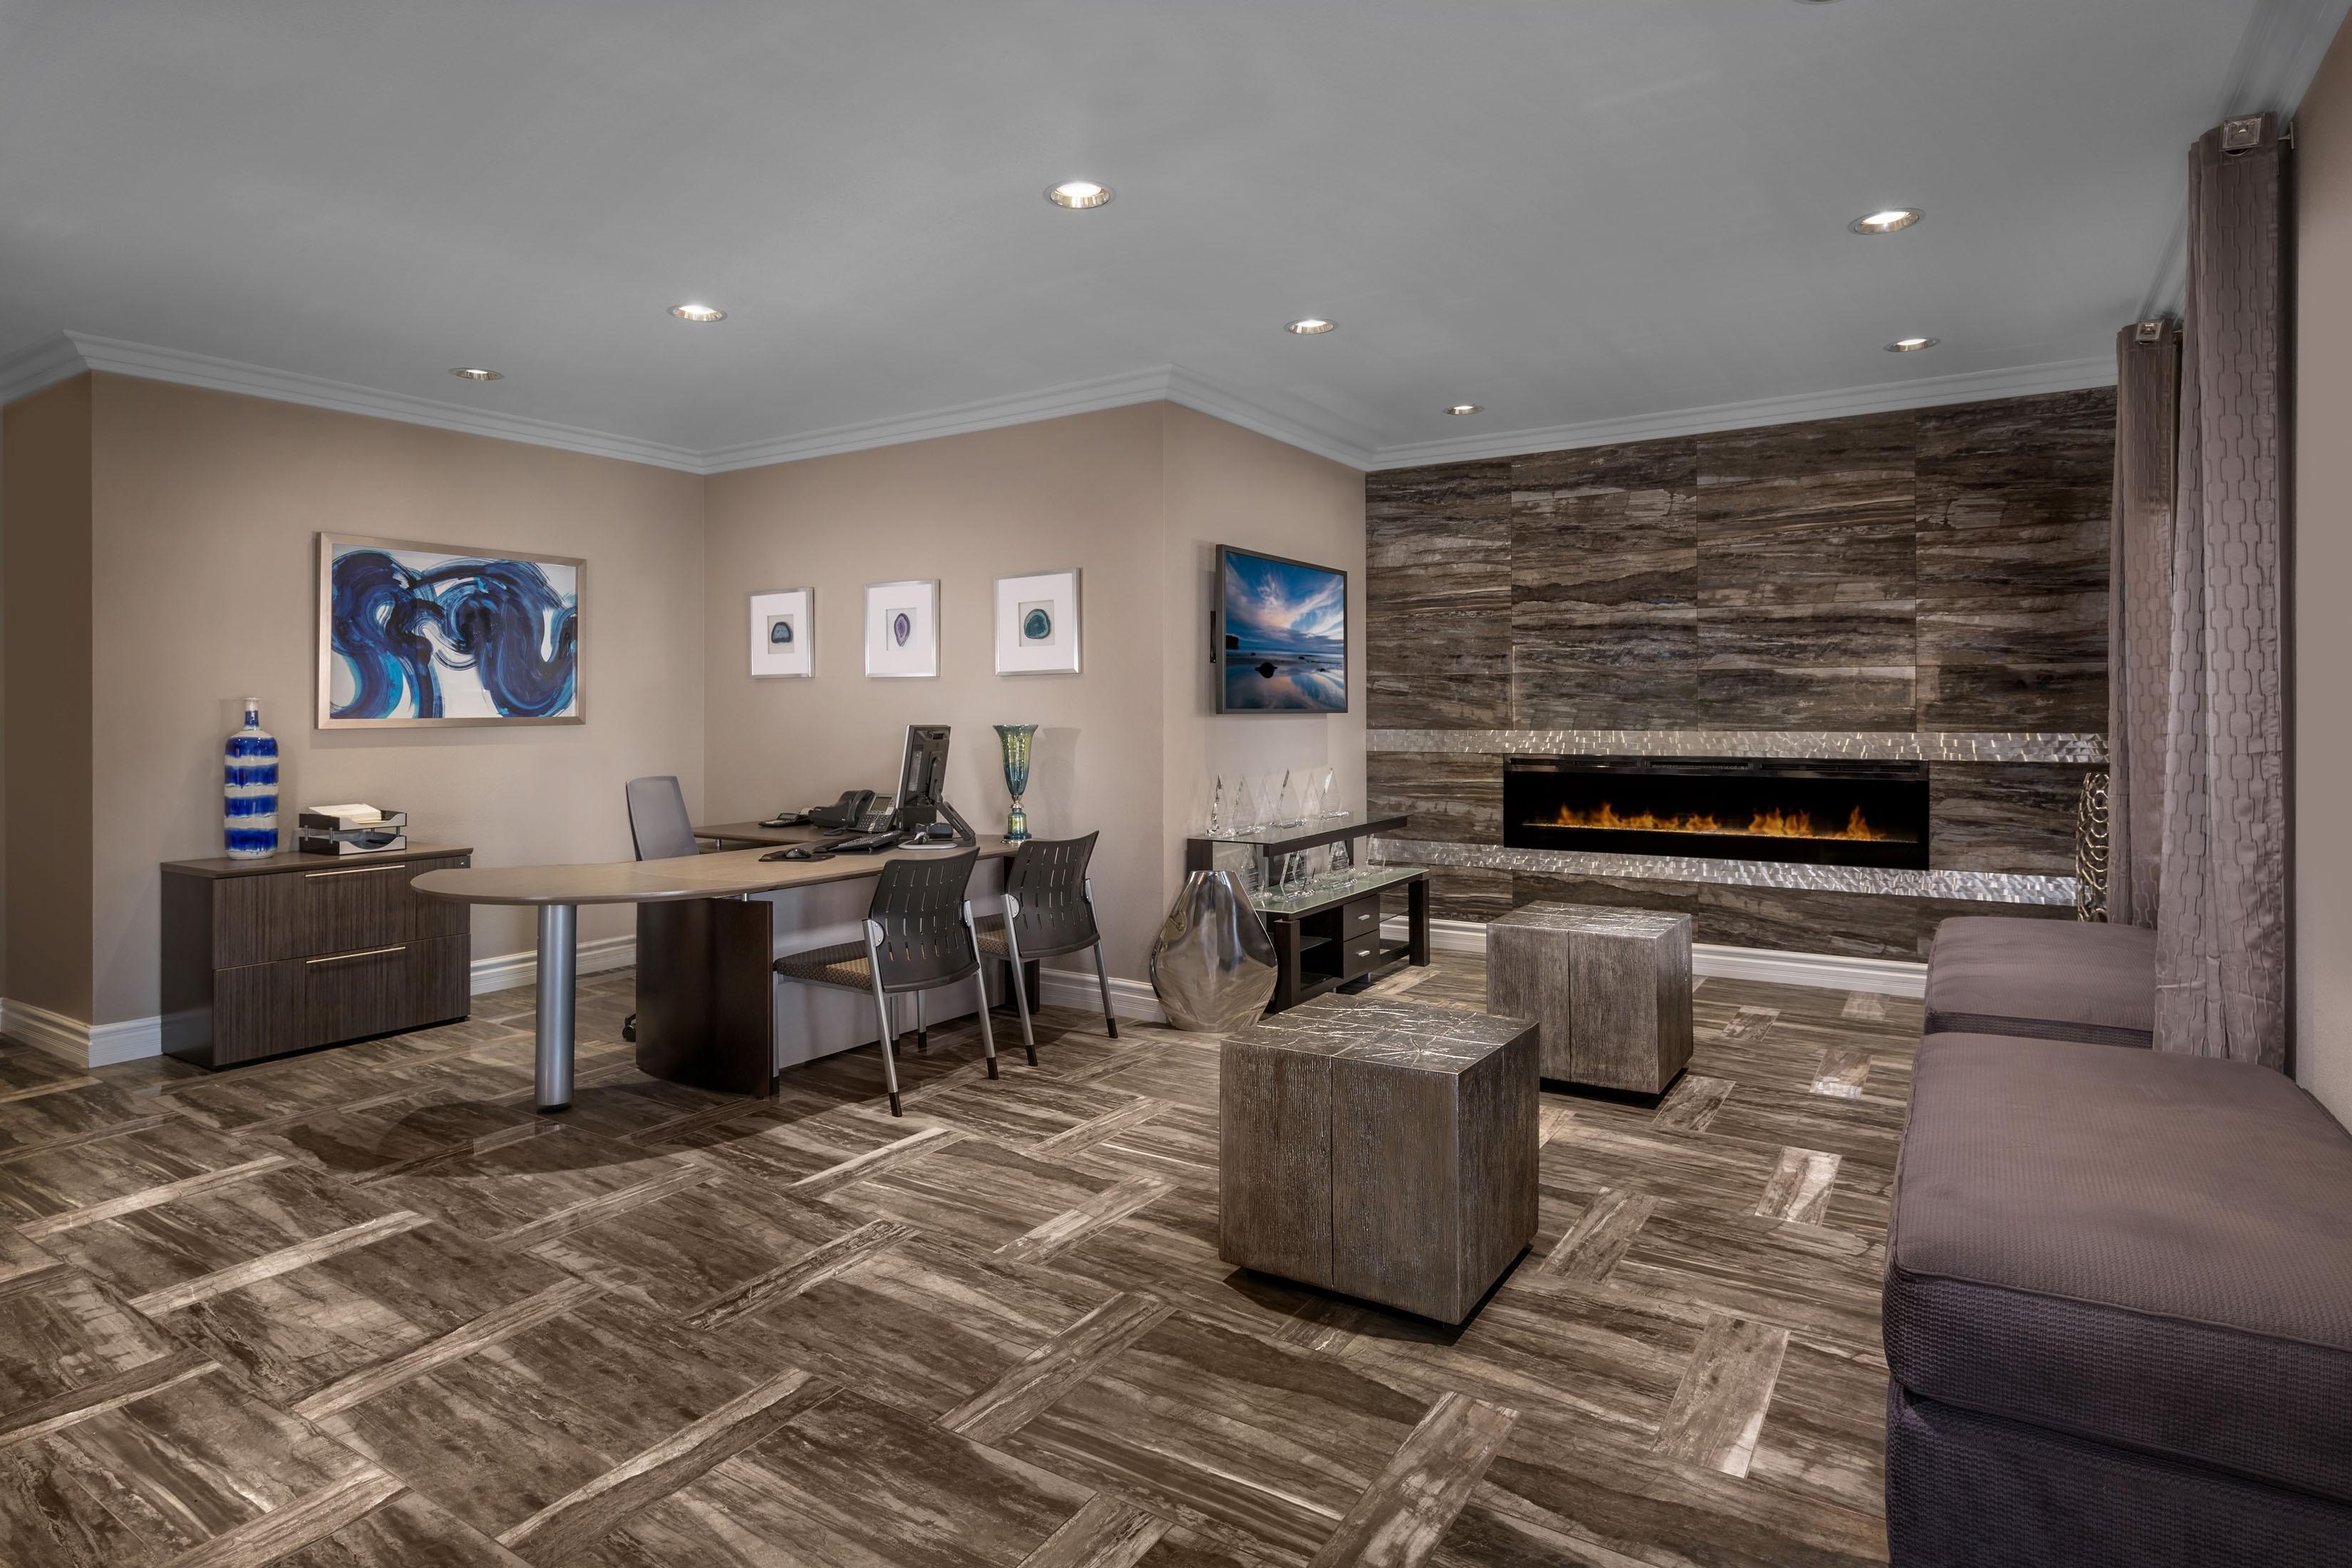 crystal cove apartments las vegas see reviews pics avail